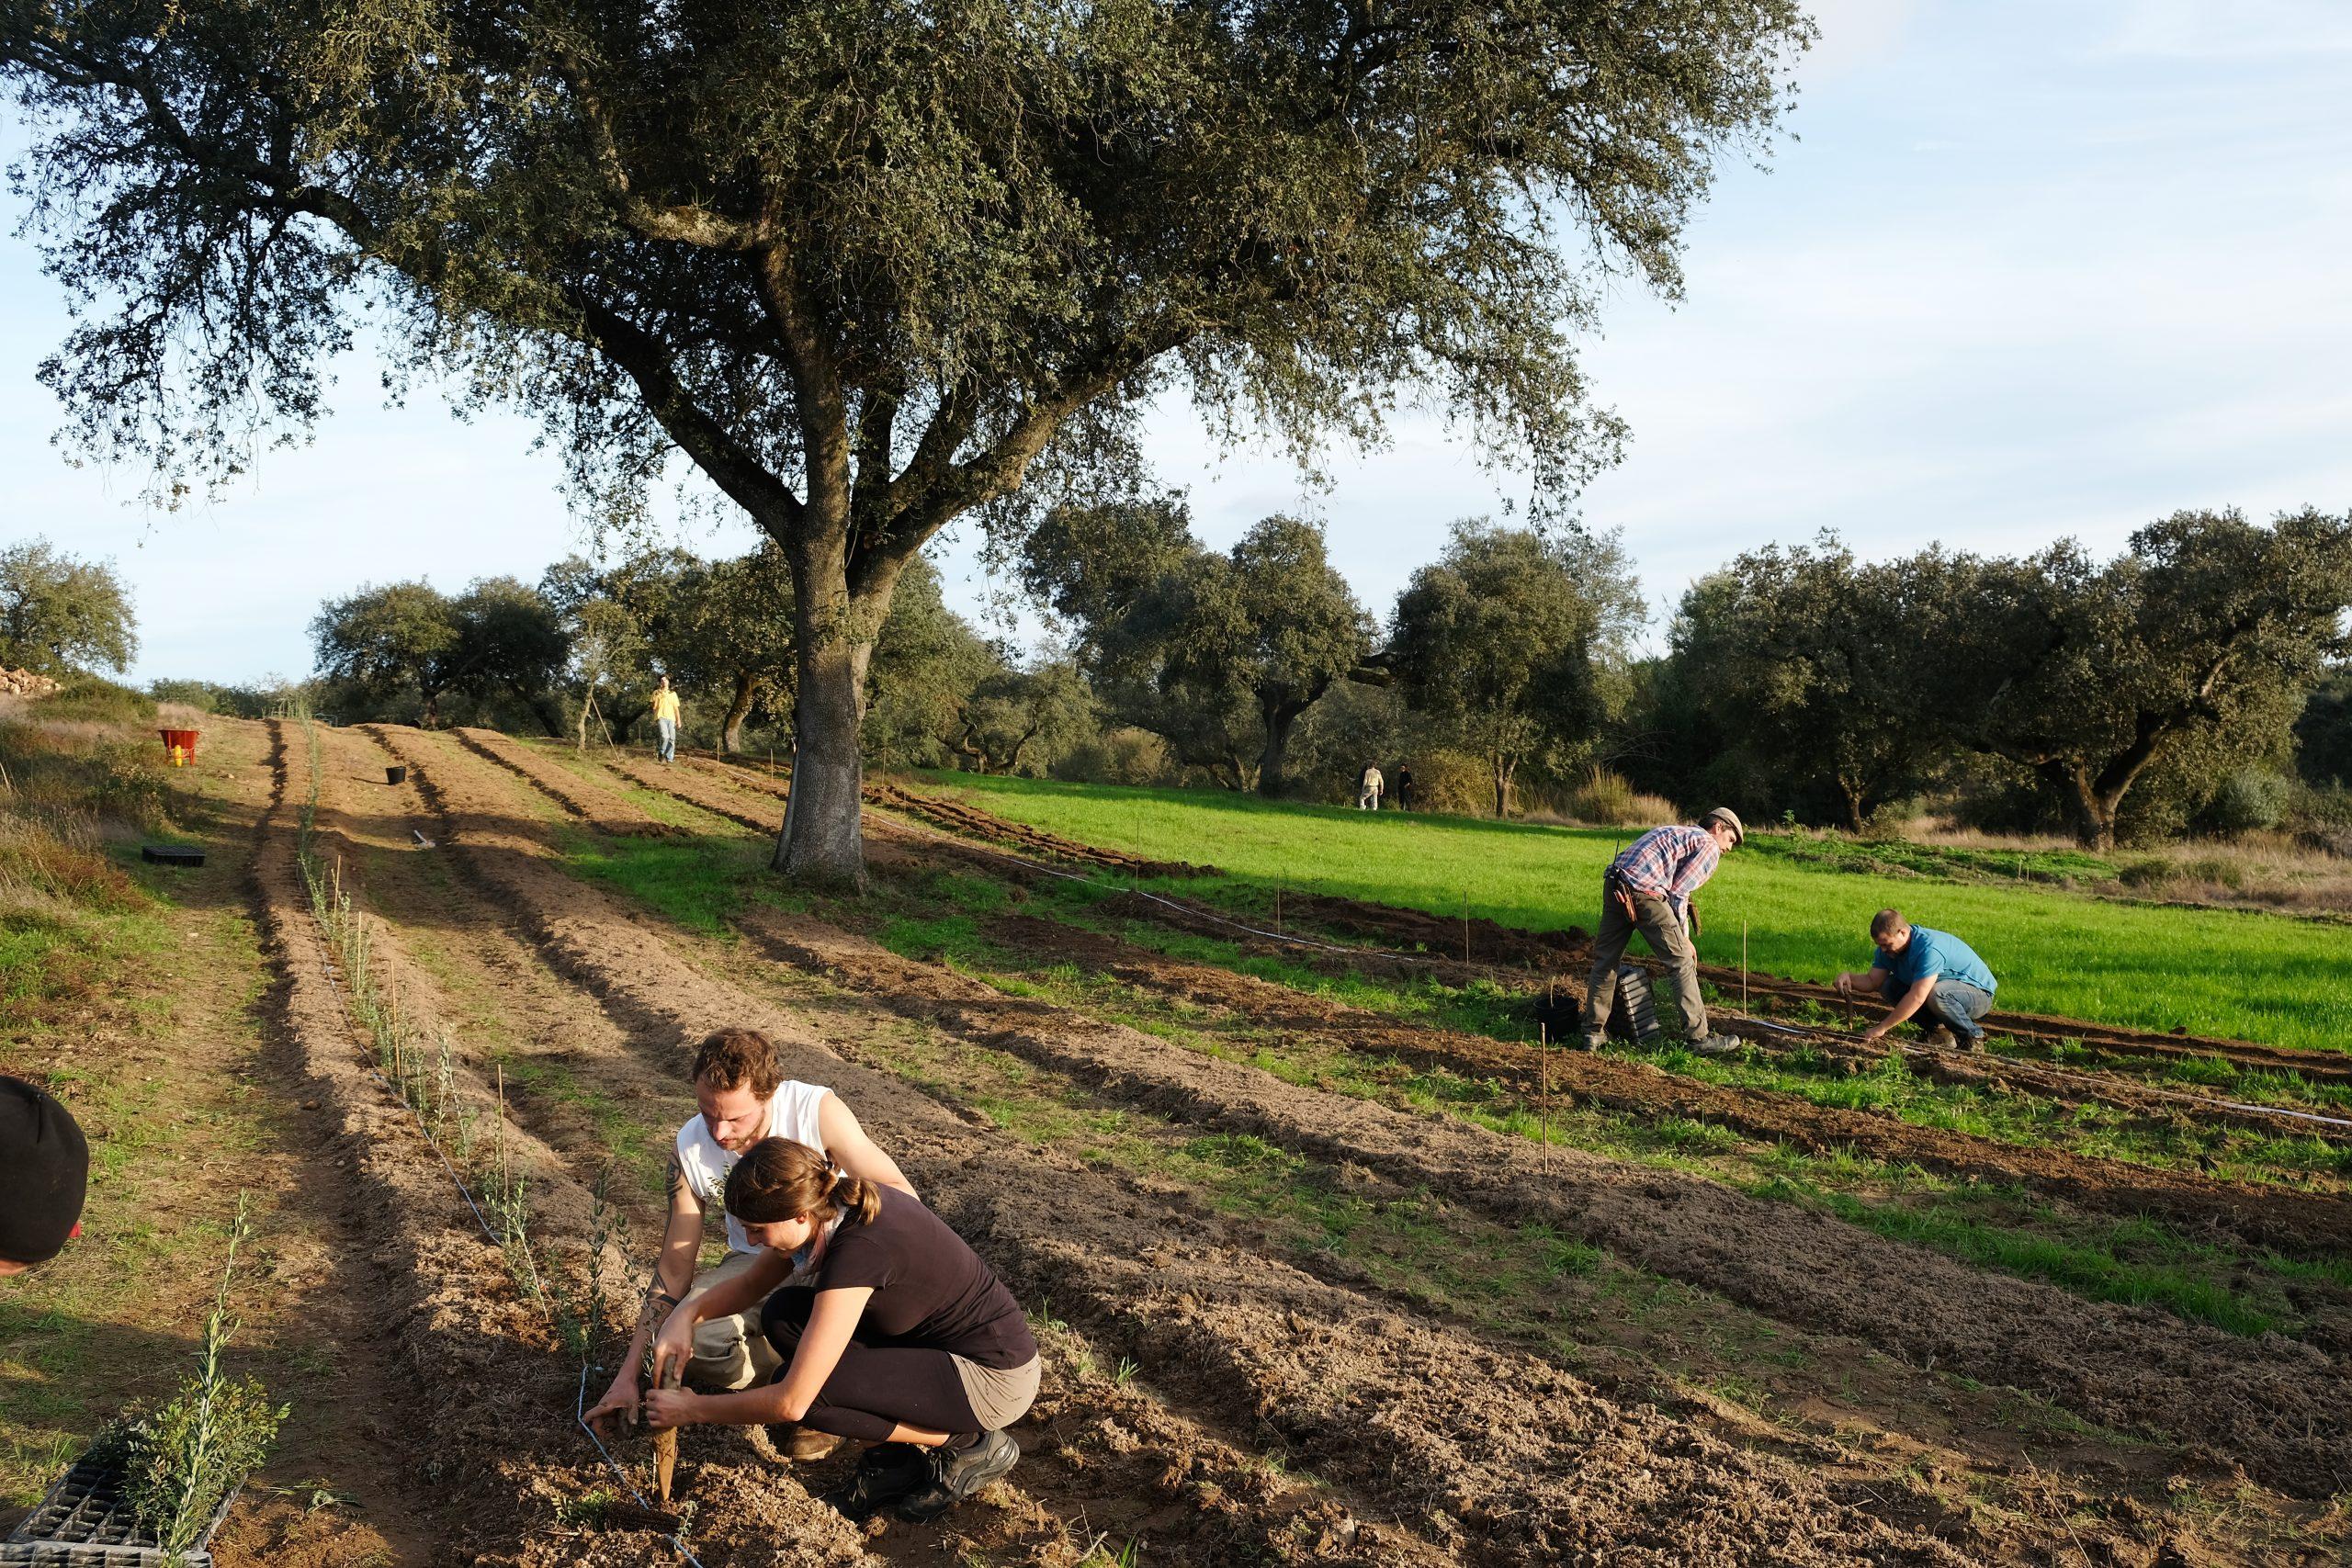 quinta-das-abelhas-portugal-planting-rows